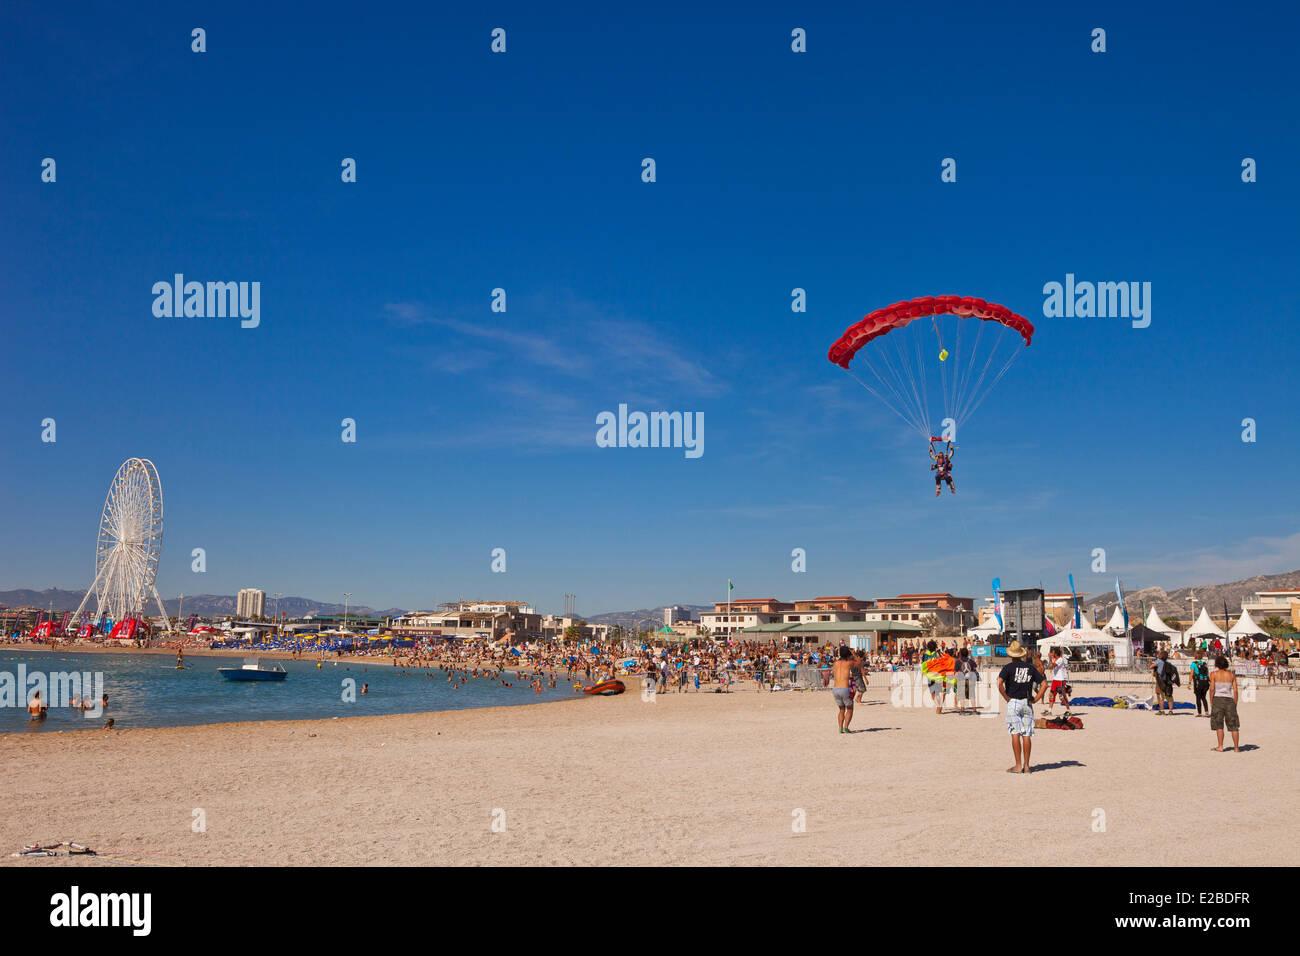 Francia, Bouches du Rhône, Marseille Bonneveine Prado, playas, playa durante la Copa Naranja Festival, primer Imagen De Stock